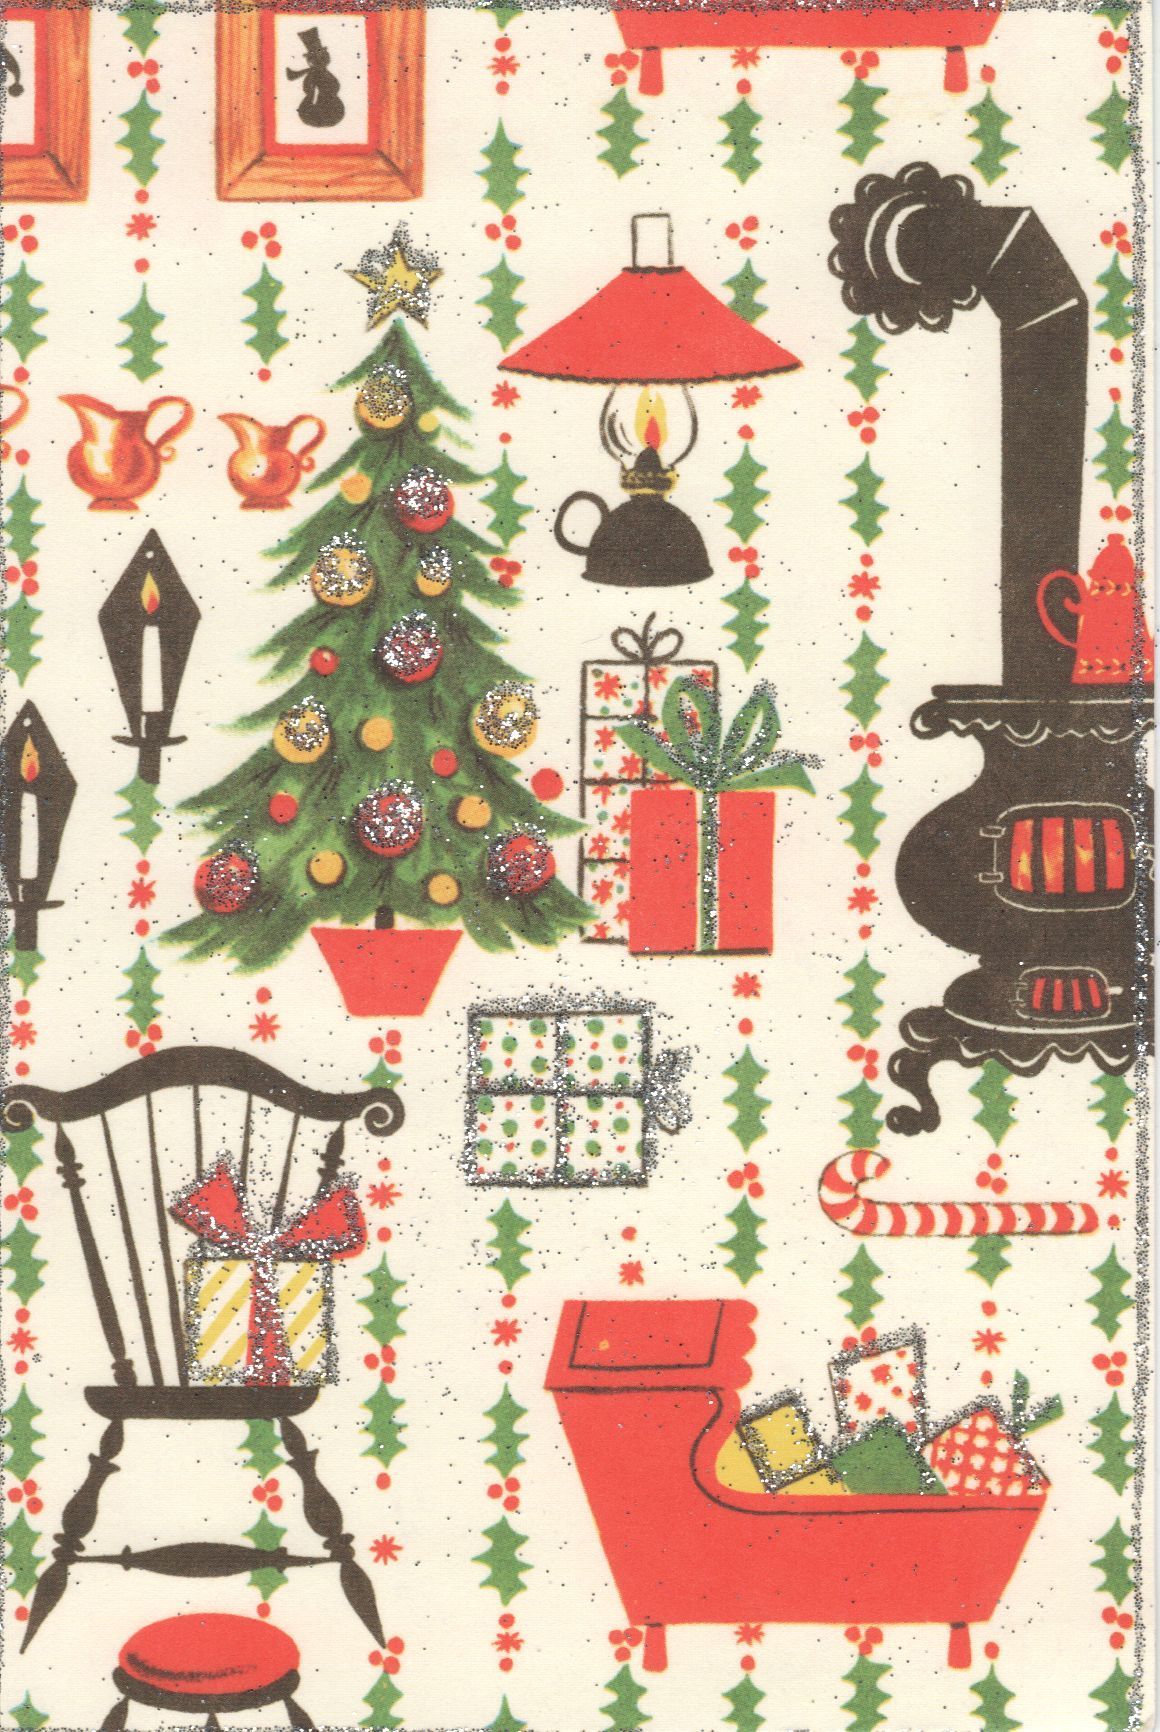 cute vintage Christmas design